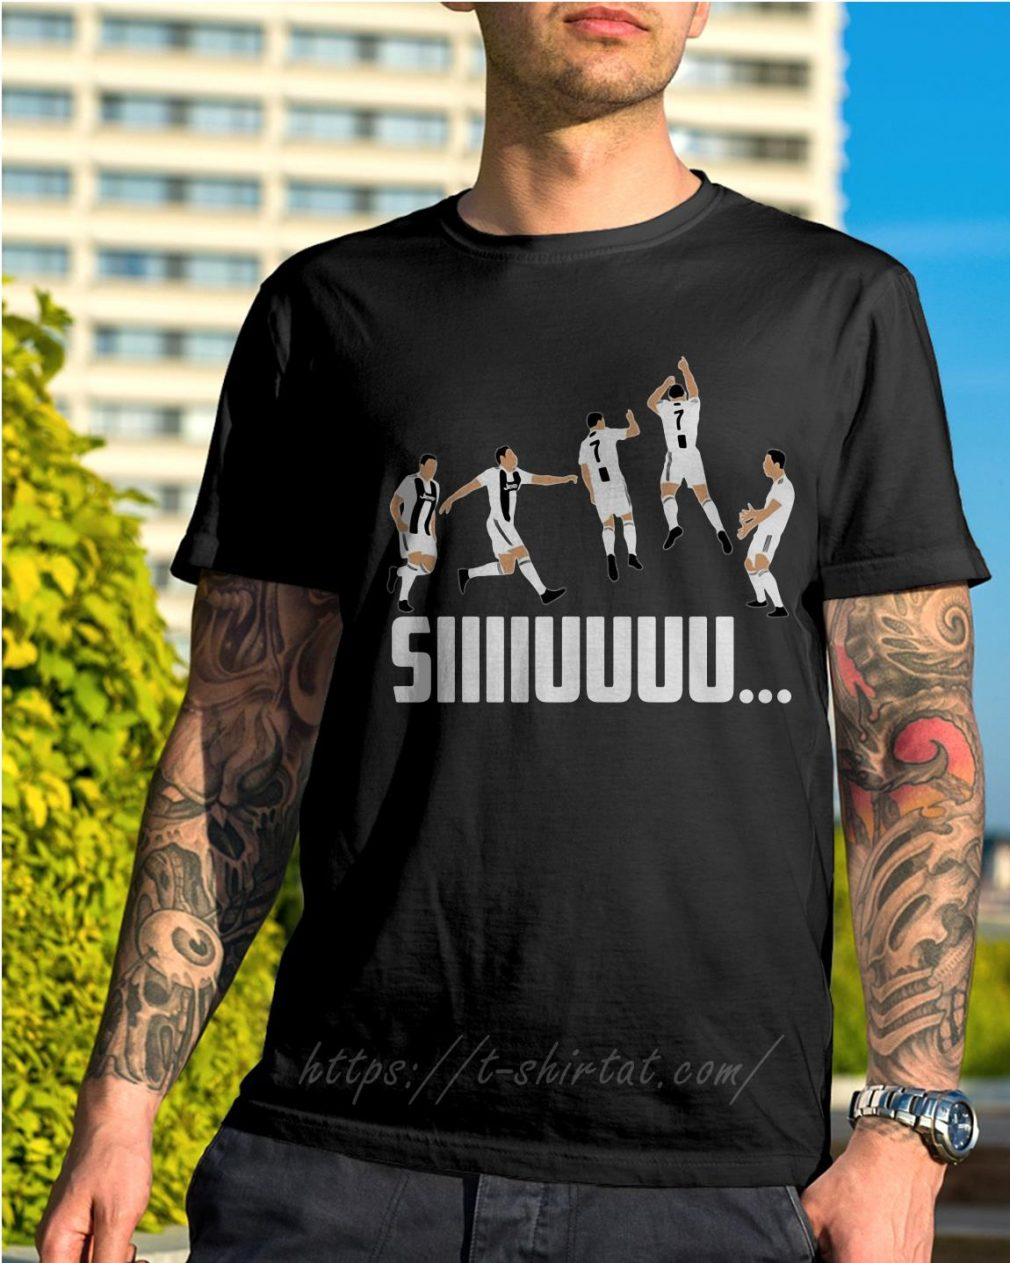 SIIIIUUUU jump CR7 Goal celebration shirt